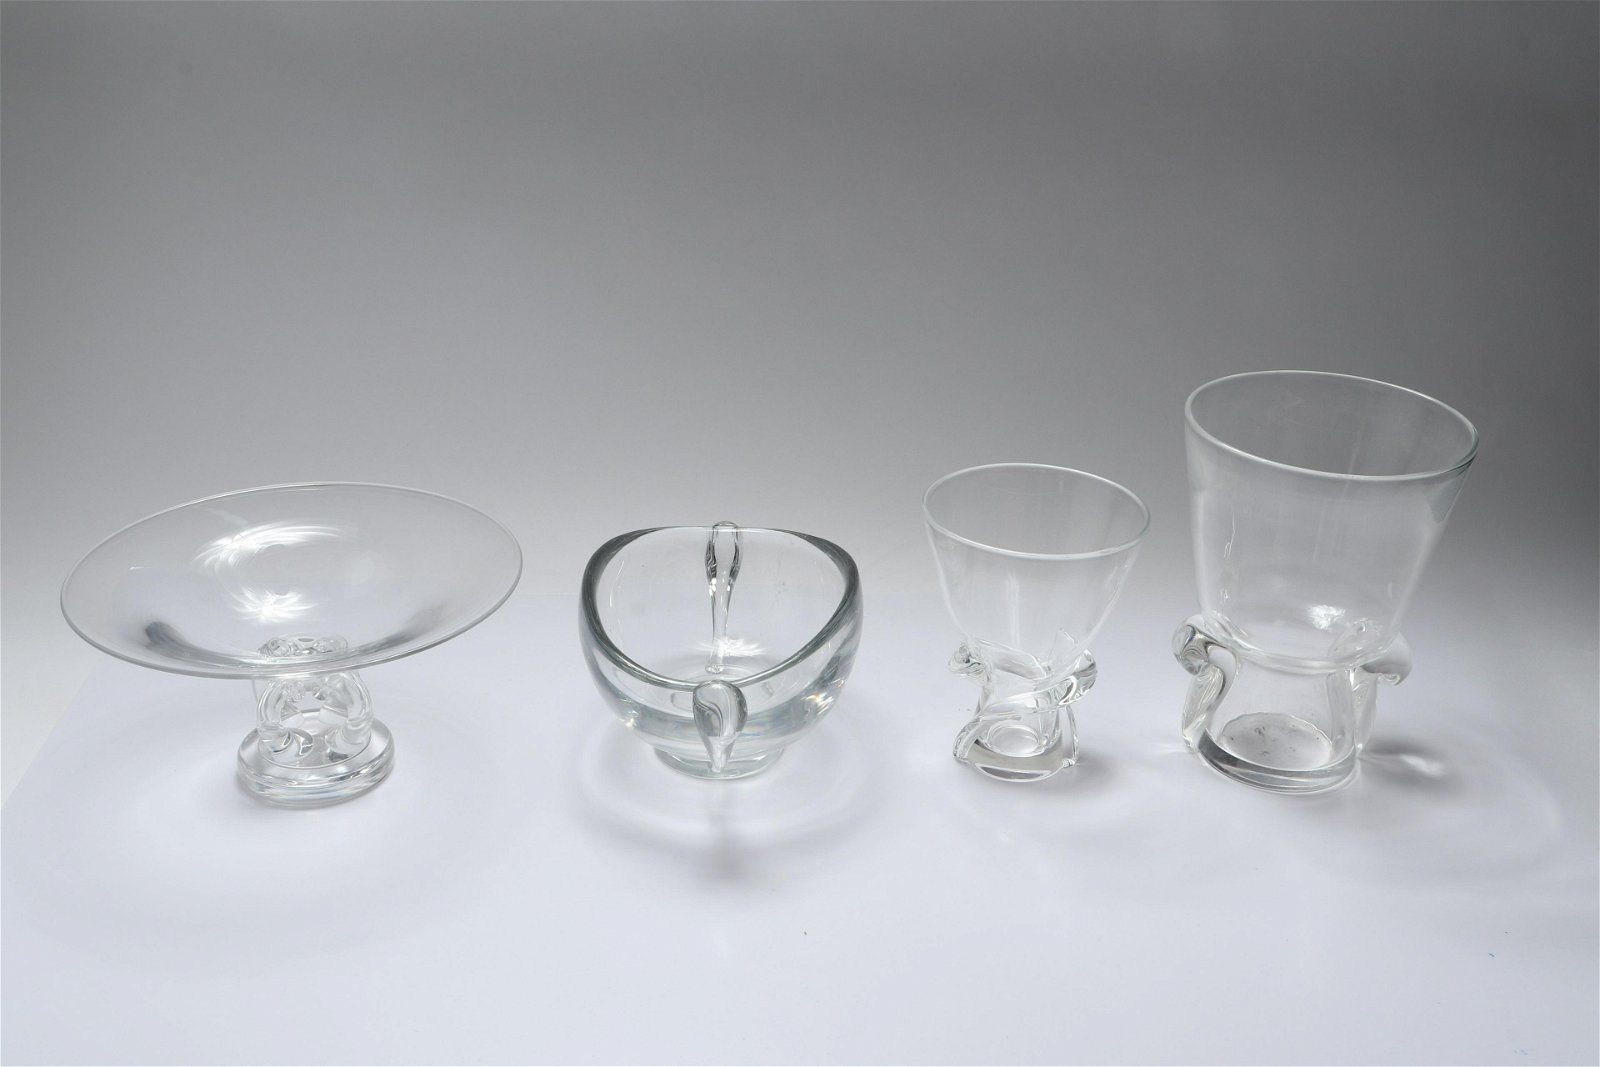 Steuben and Kosta Crystal Vessels, 4